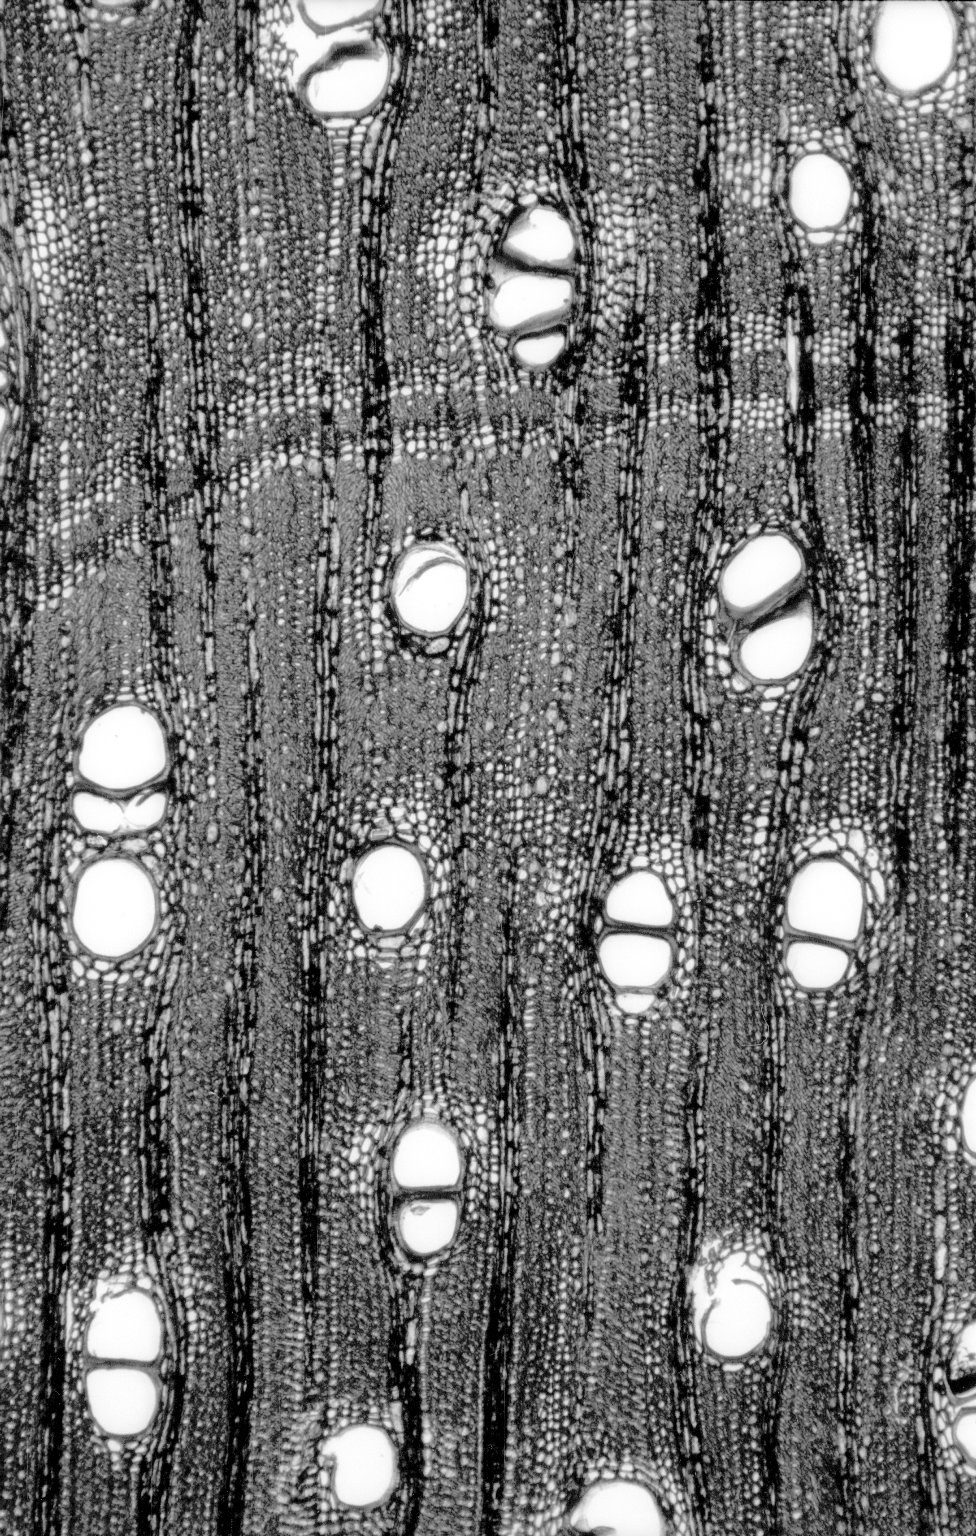 LEGUMINOSAE DETARIOIDEAE Hardwickia binata